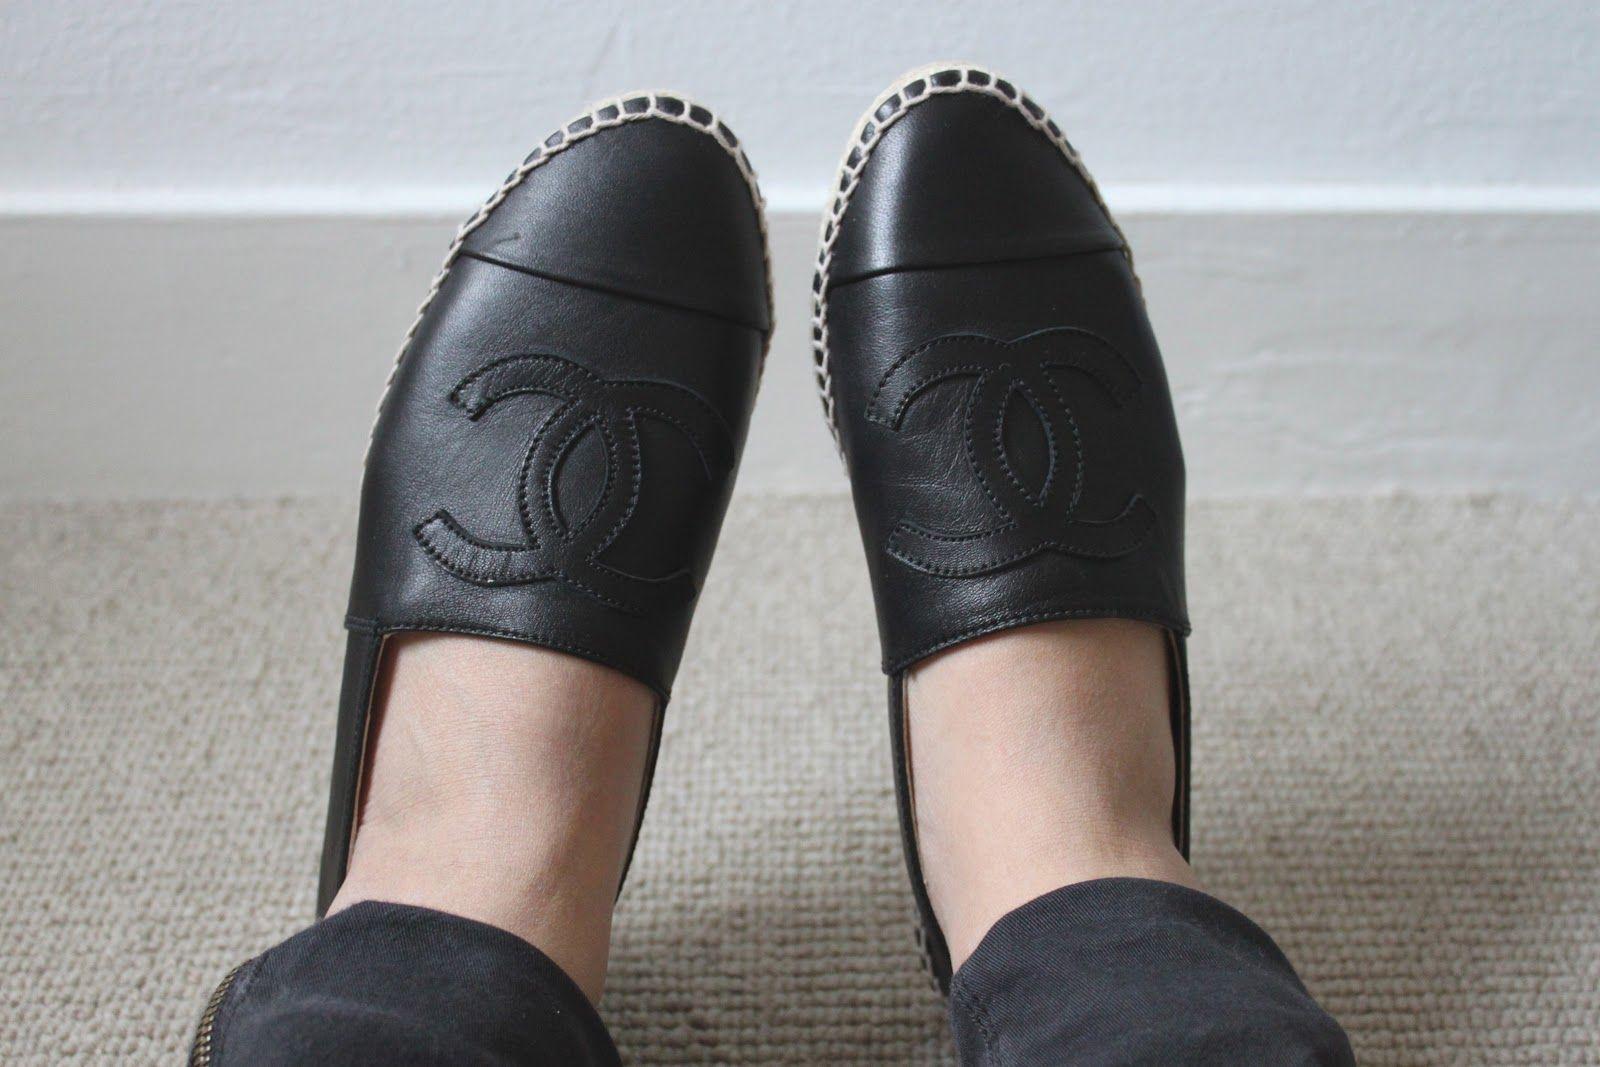 ef946c12a4 Chanel shoes. Shoes online